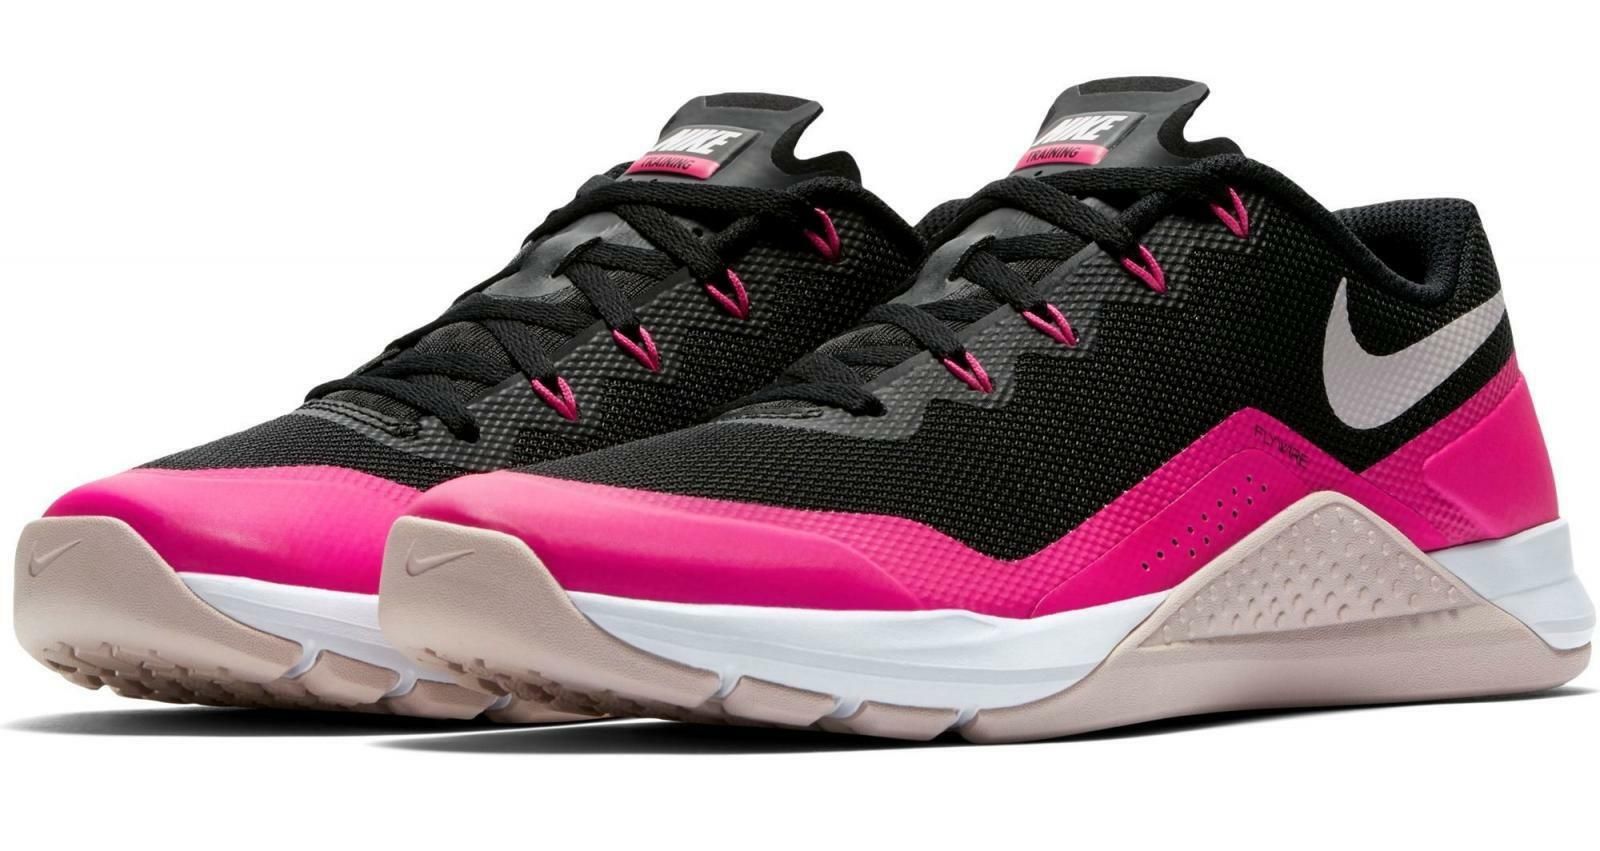 Damen Nike Metcon Metcon Metcon Pepper Dsx Schwarz Rot Rosa Turnschuhe 902173 012   bc63b1